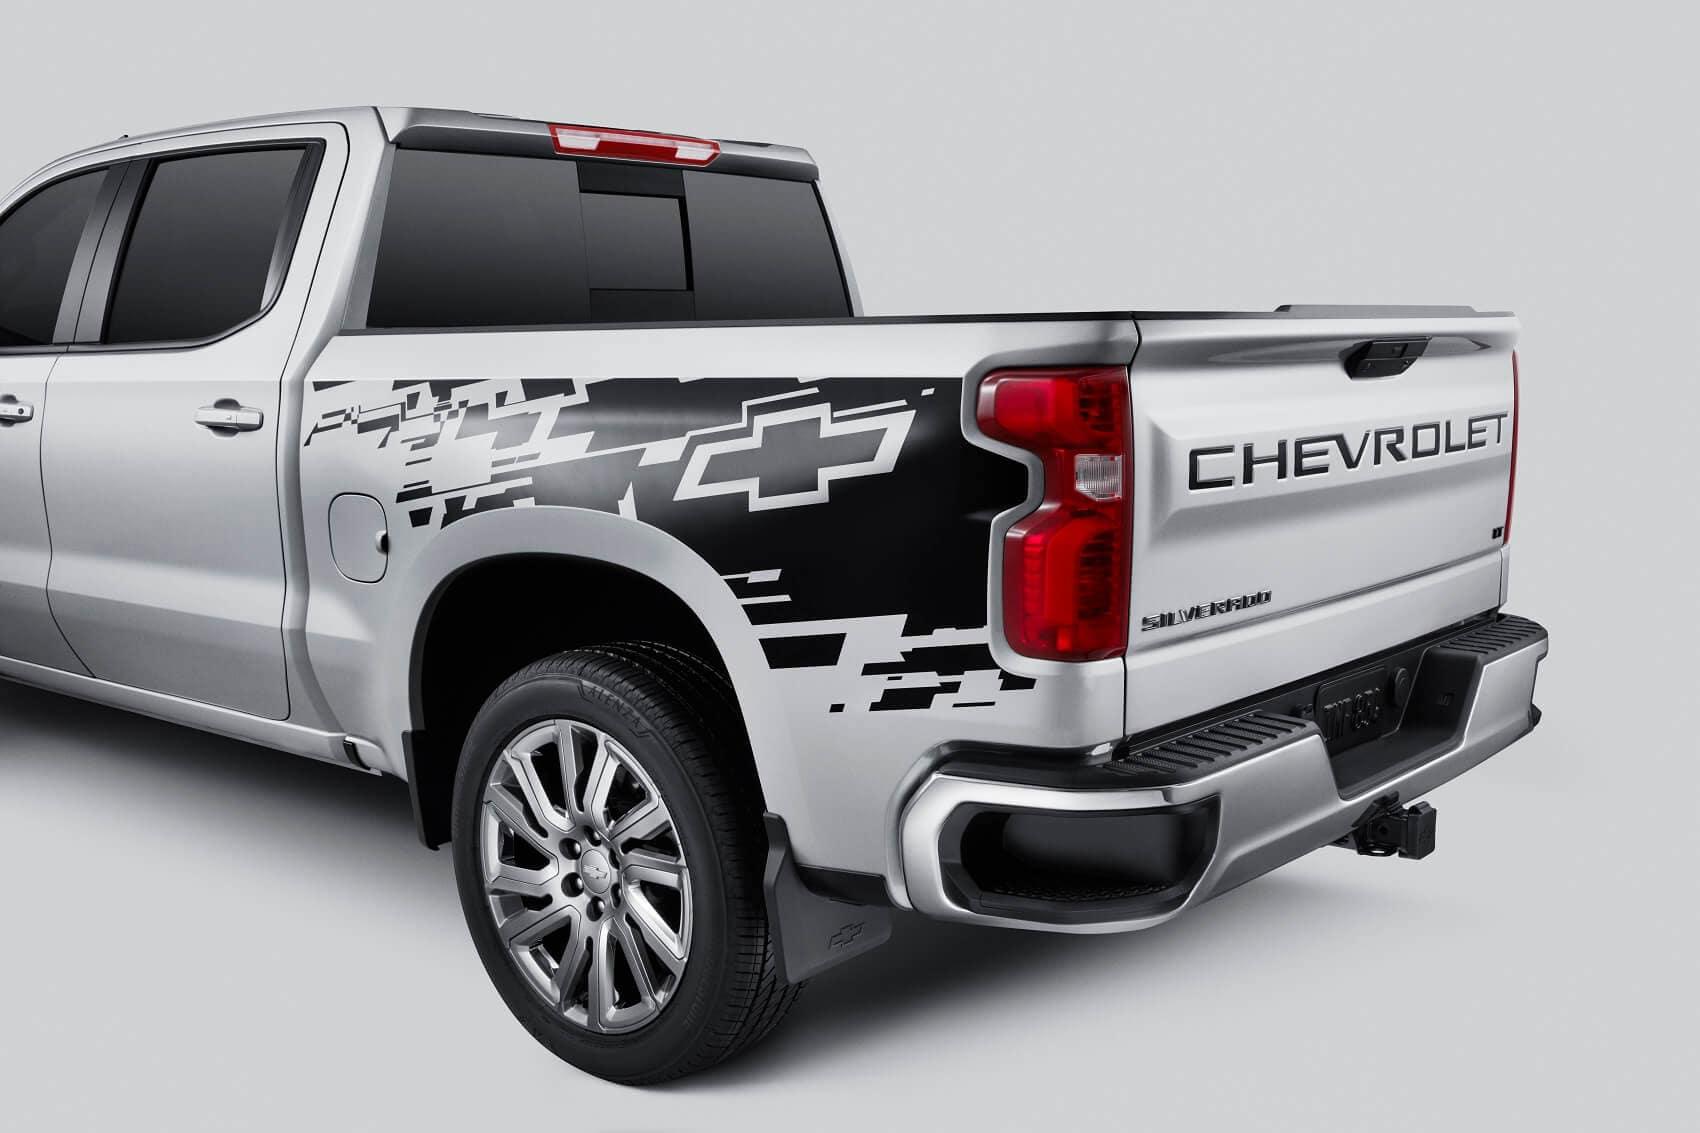 CHEVY SILVERADO VS RAM 1500 ENGINES